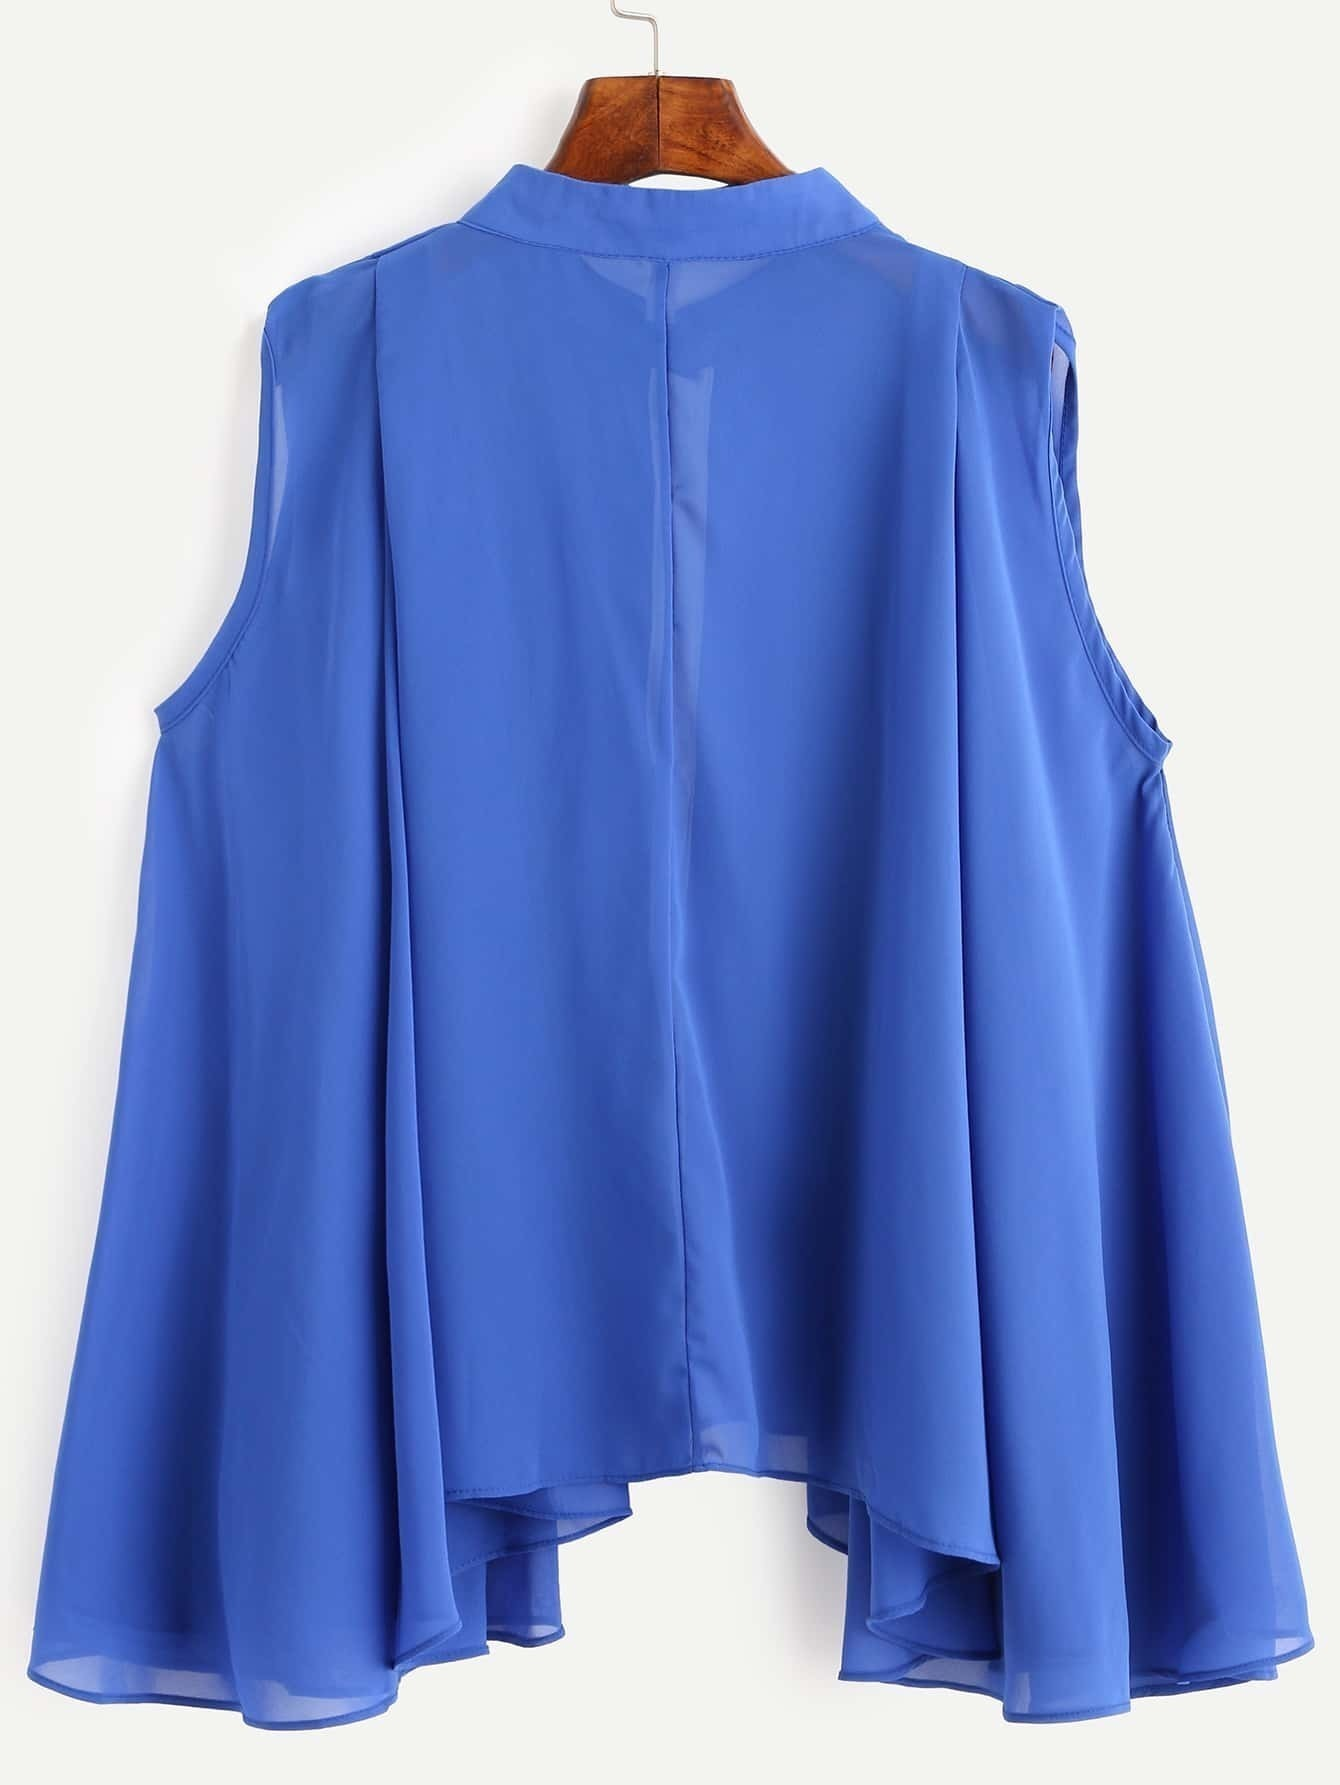 Royal Blue Contrast Placket Asymmetrical Chiffon Blousefor